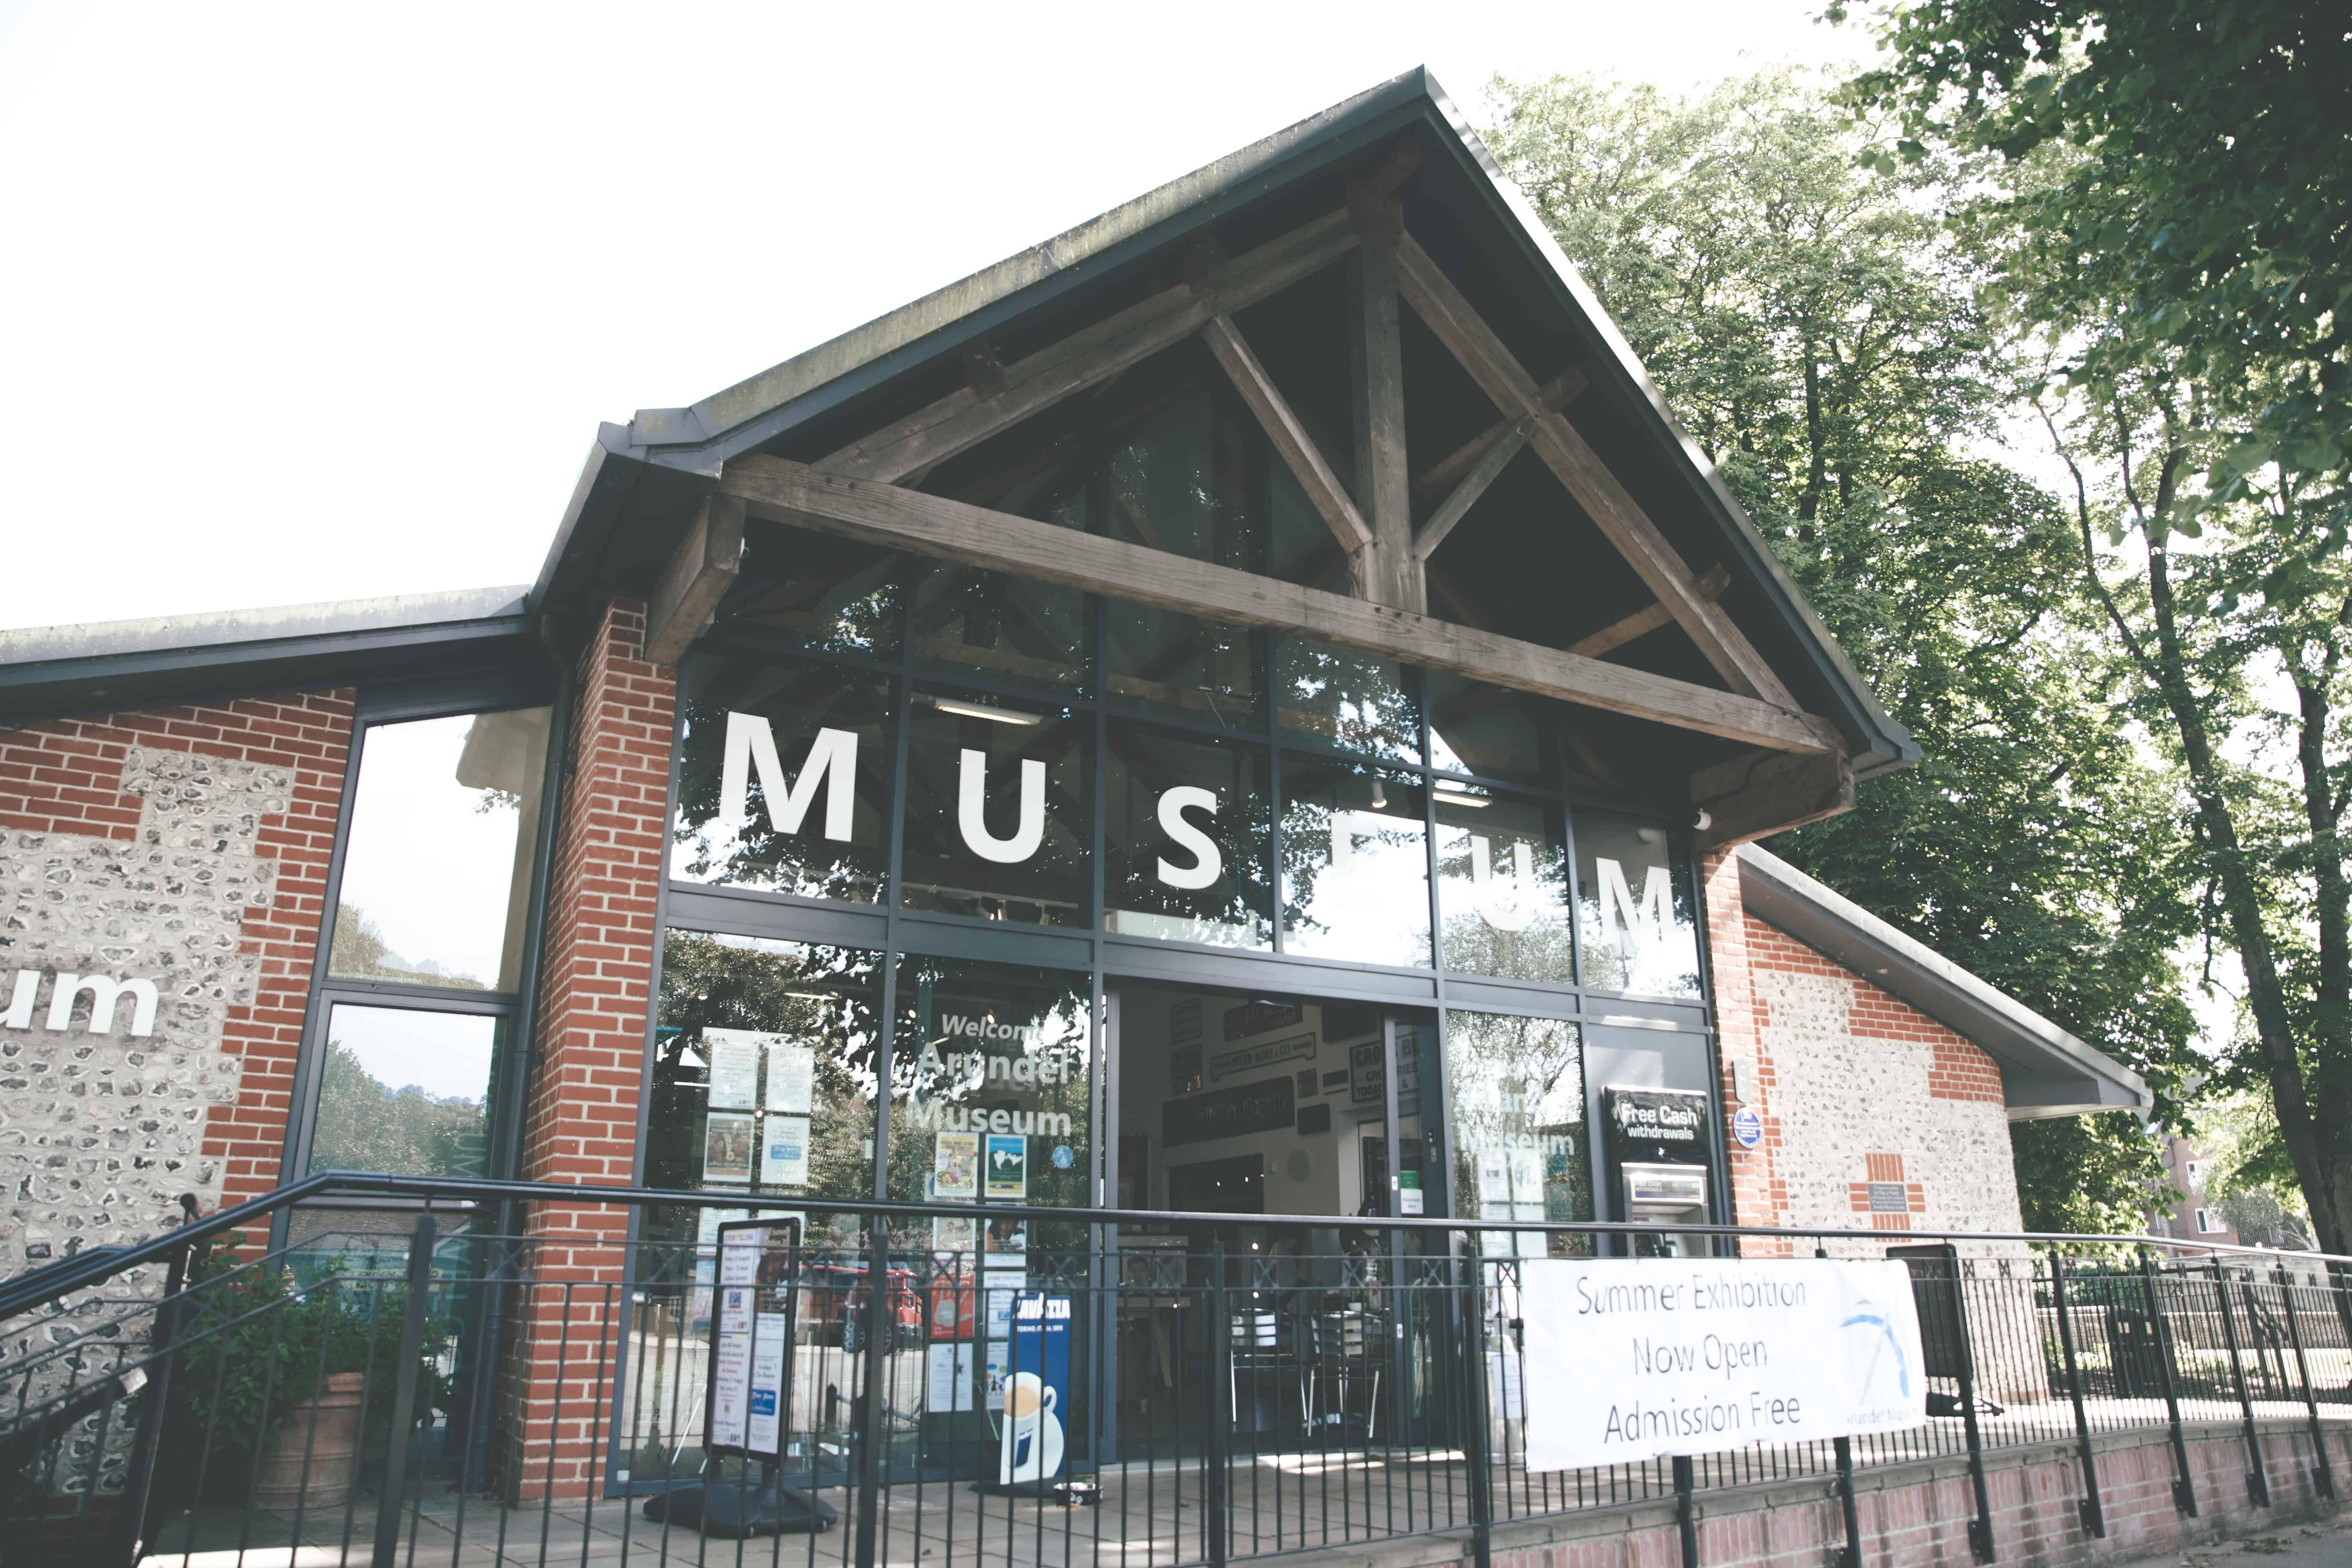 Arundel Museum in Arundel, England